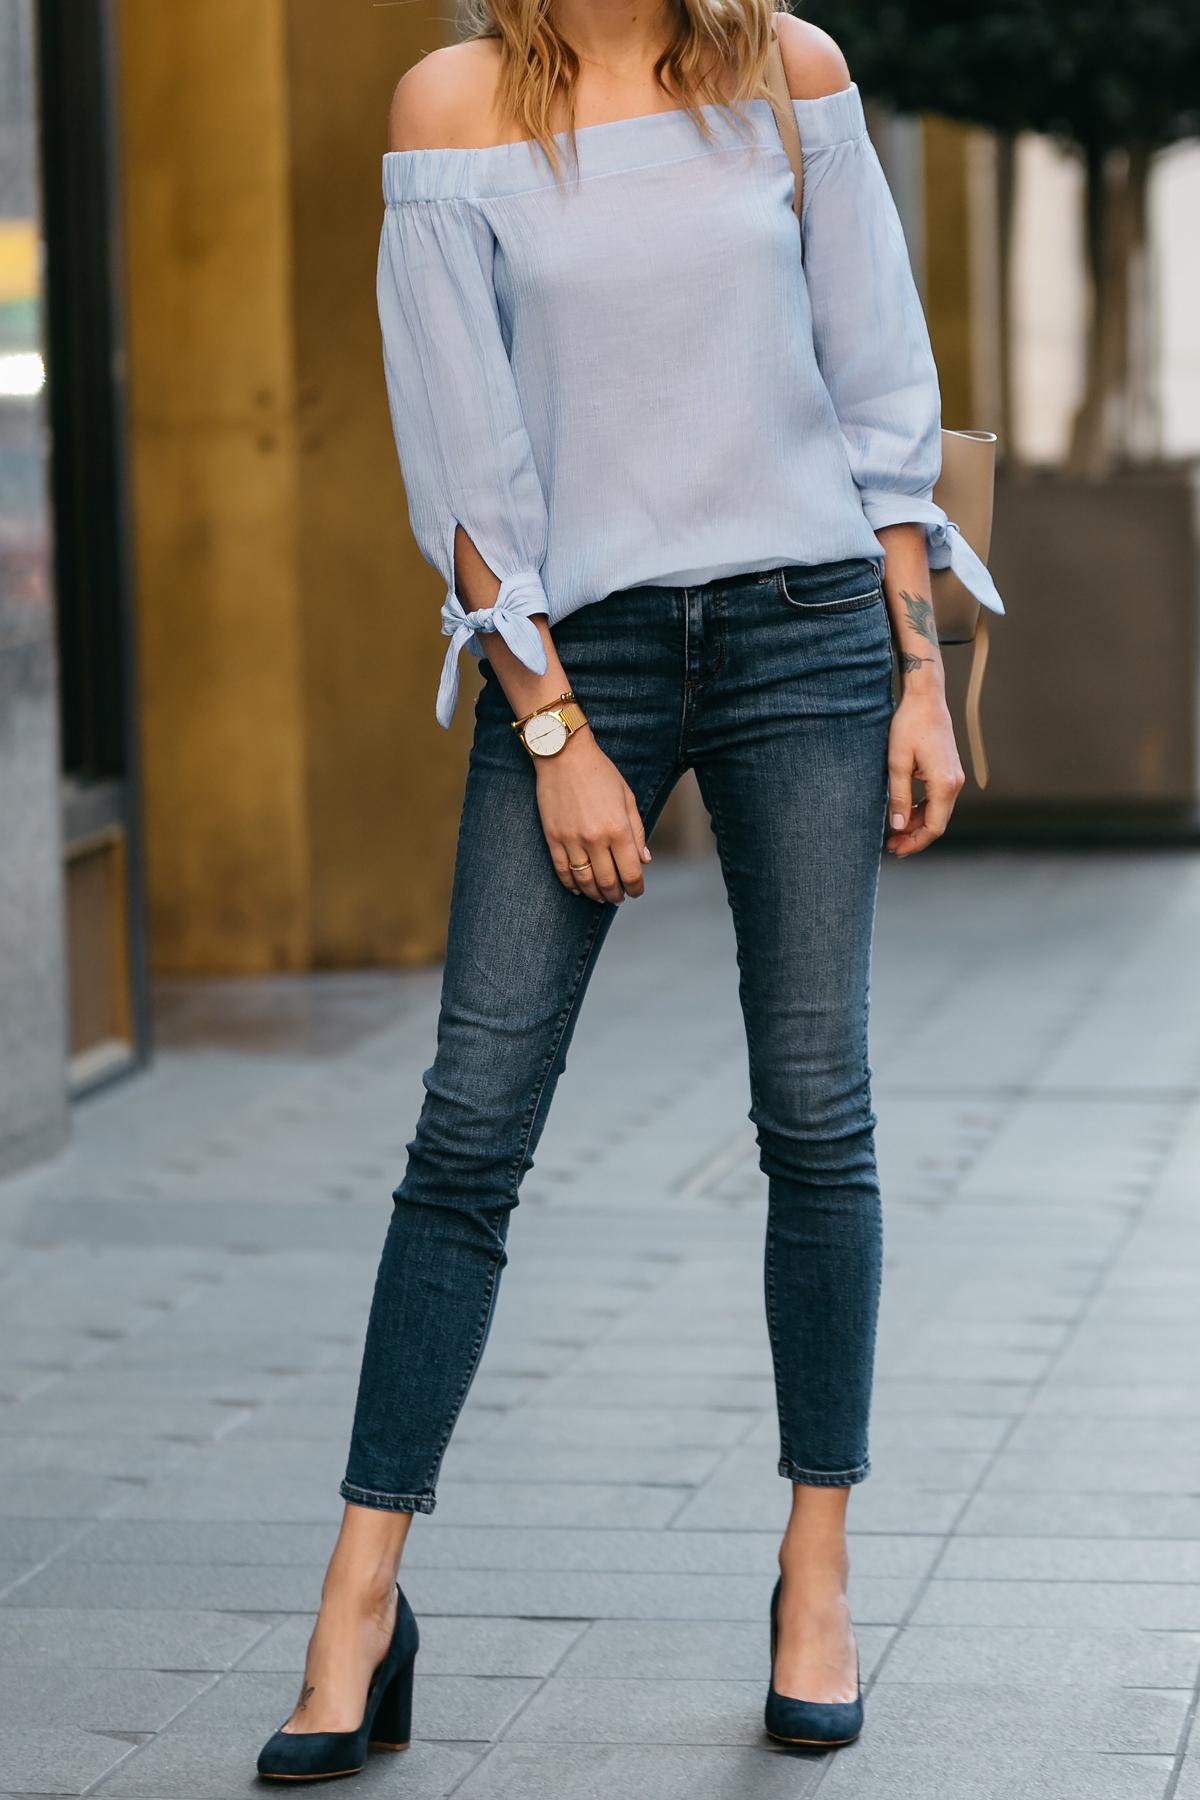 Fashion Jackson, Dallas Blogger, Fashion Blogger, Street Style, Ann Taylor Blue Tie Off-the-shoulder Top, Denim Skinny Jeans, Navy Suede Block Heel Pumps, Celine Belt Bag